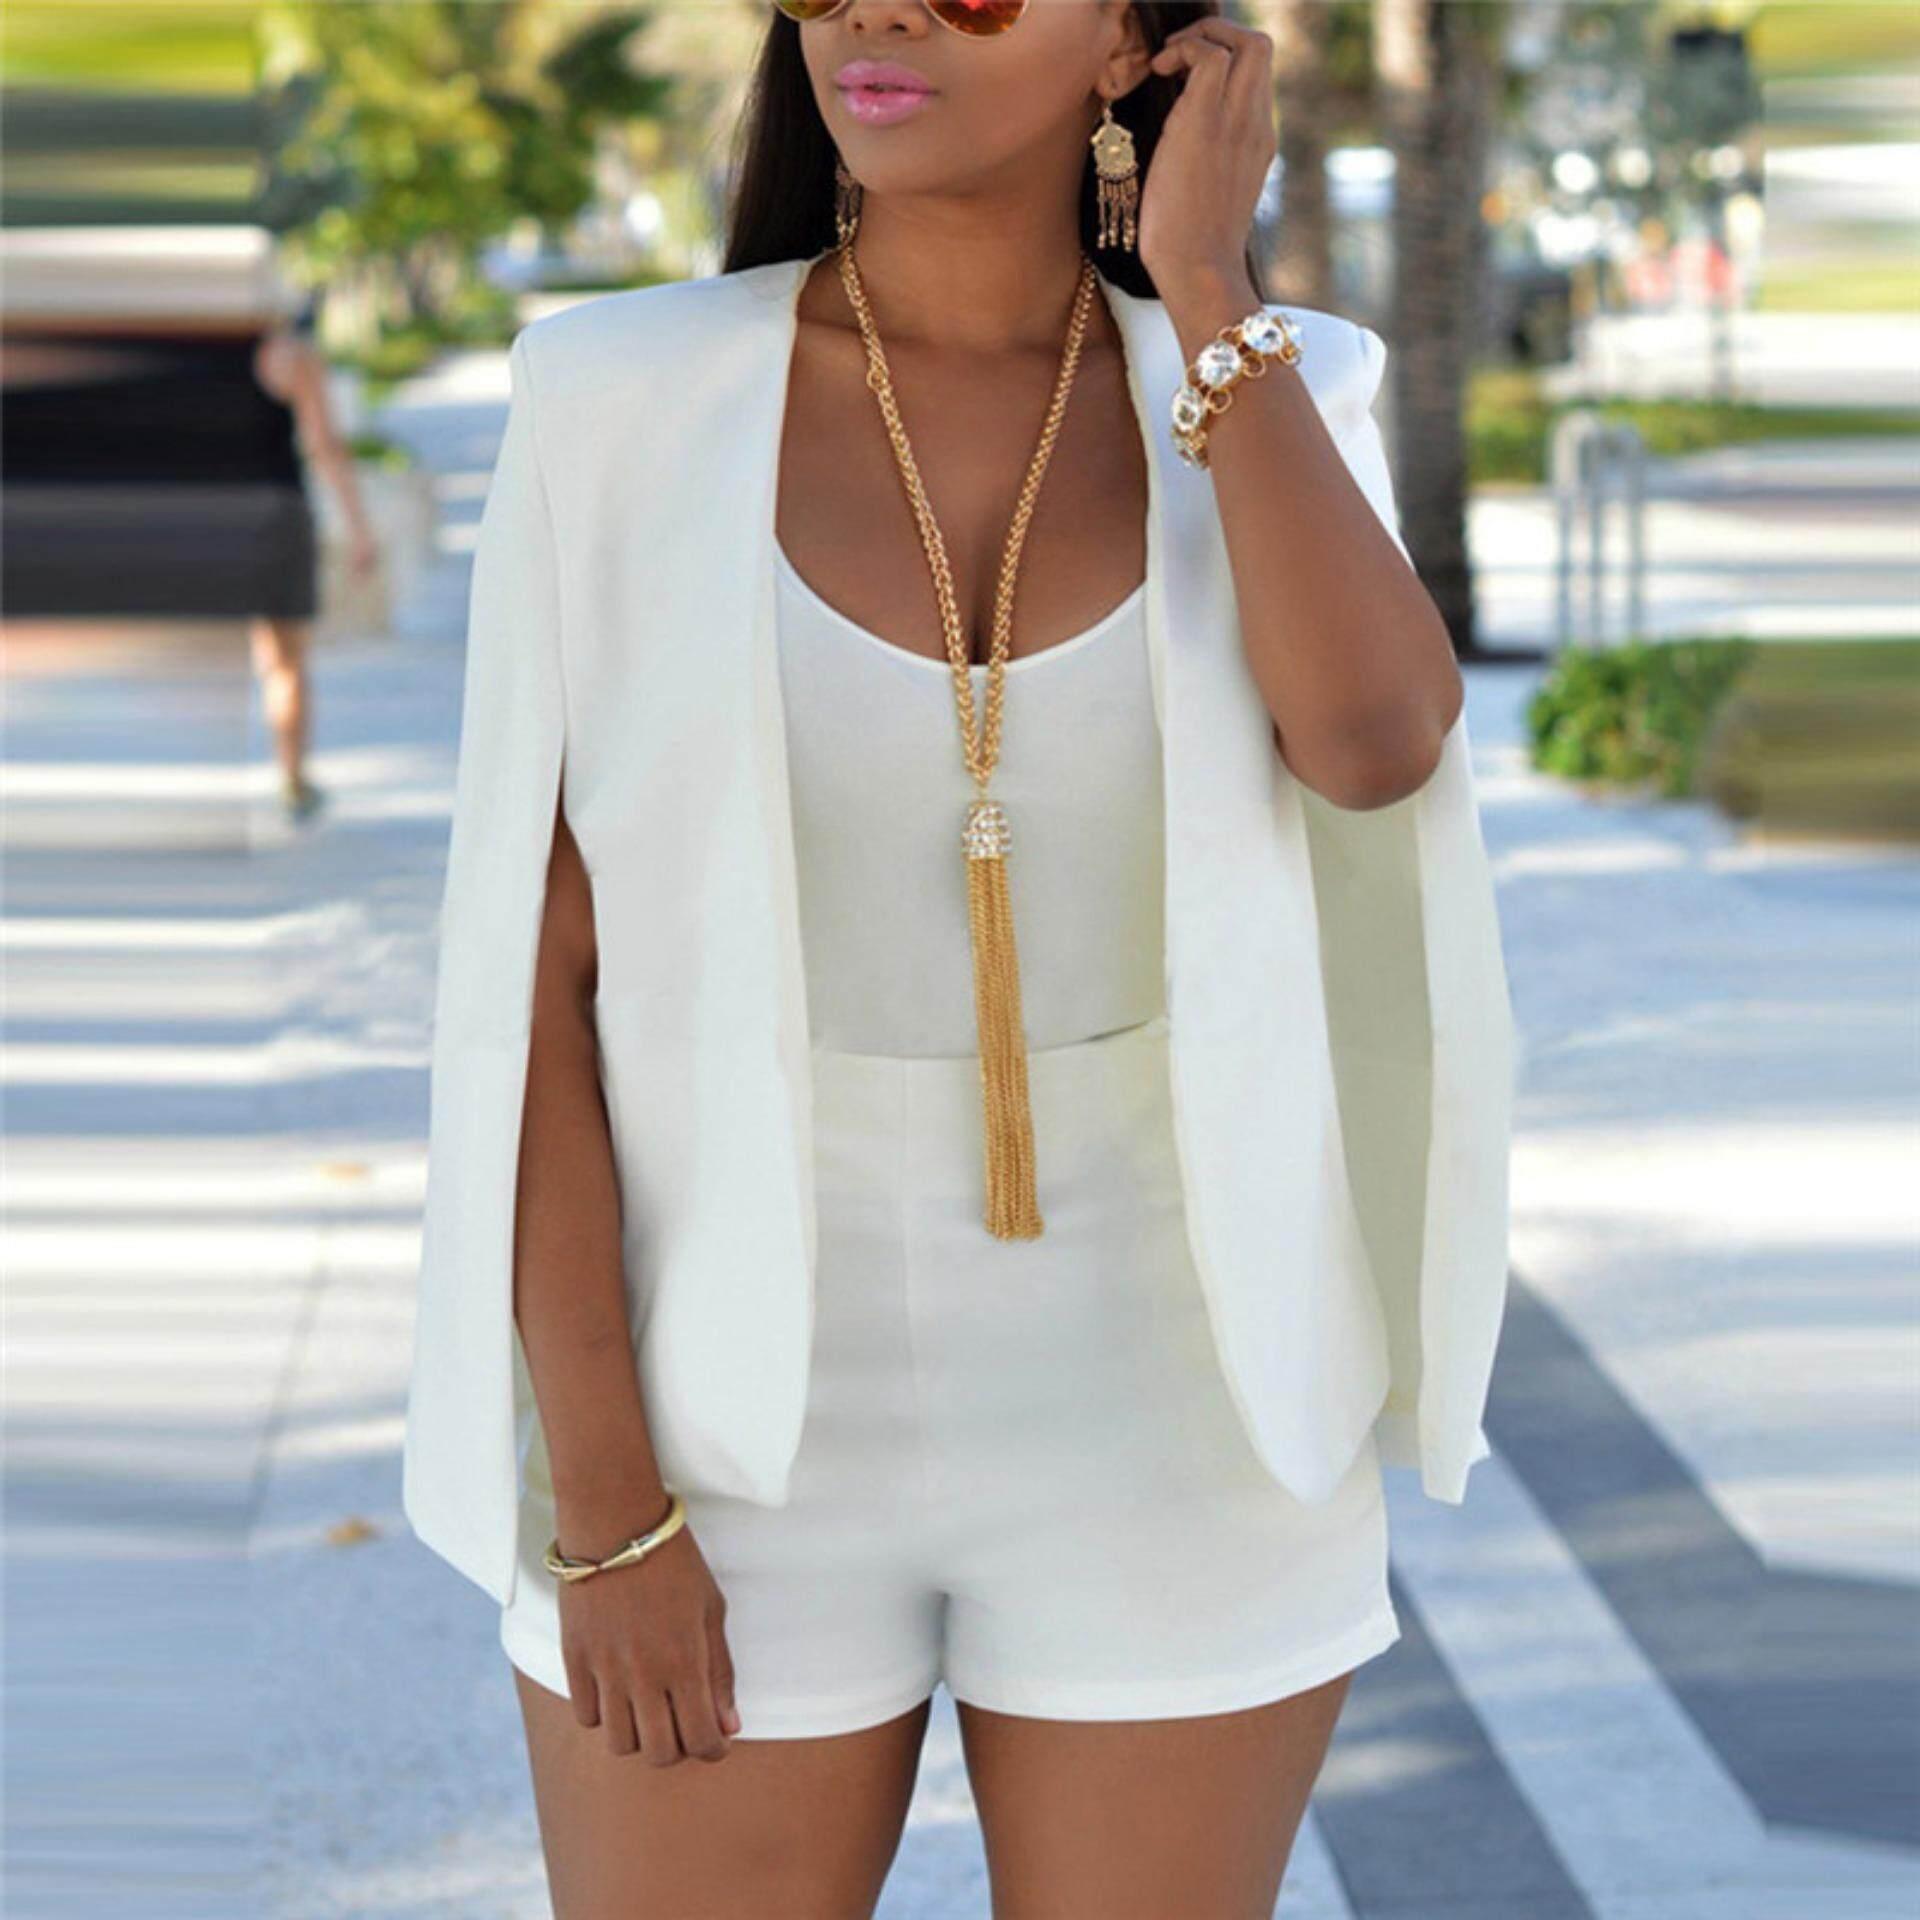 654f139dd6c Veli shy Female Slim Lapel Cape Casual Business Blazer Suit Jacket Coat  Outwear White Tag Size